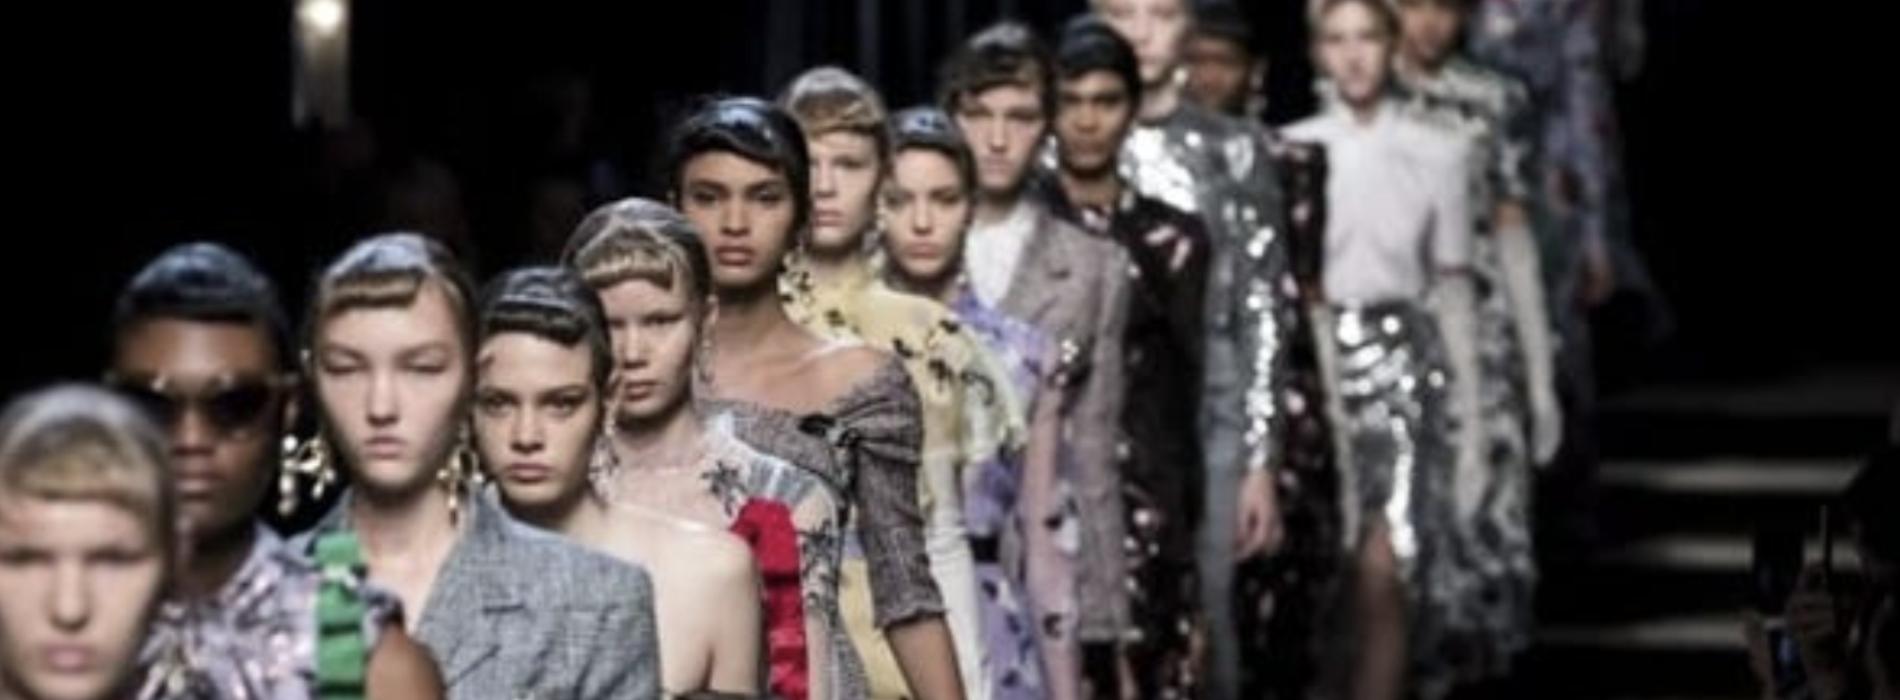 Da Caserta a Milano per la Fashion Week, ma è digital edition